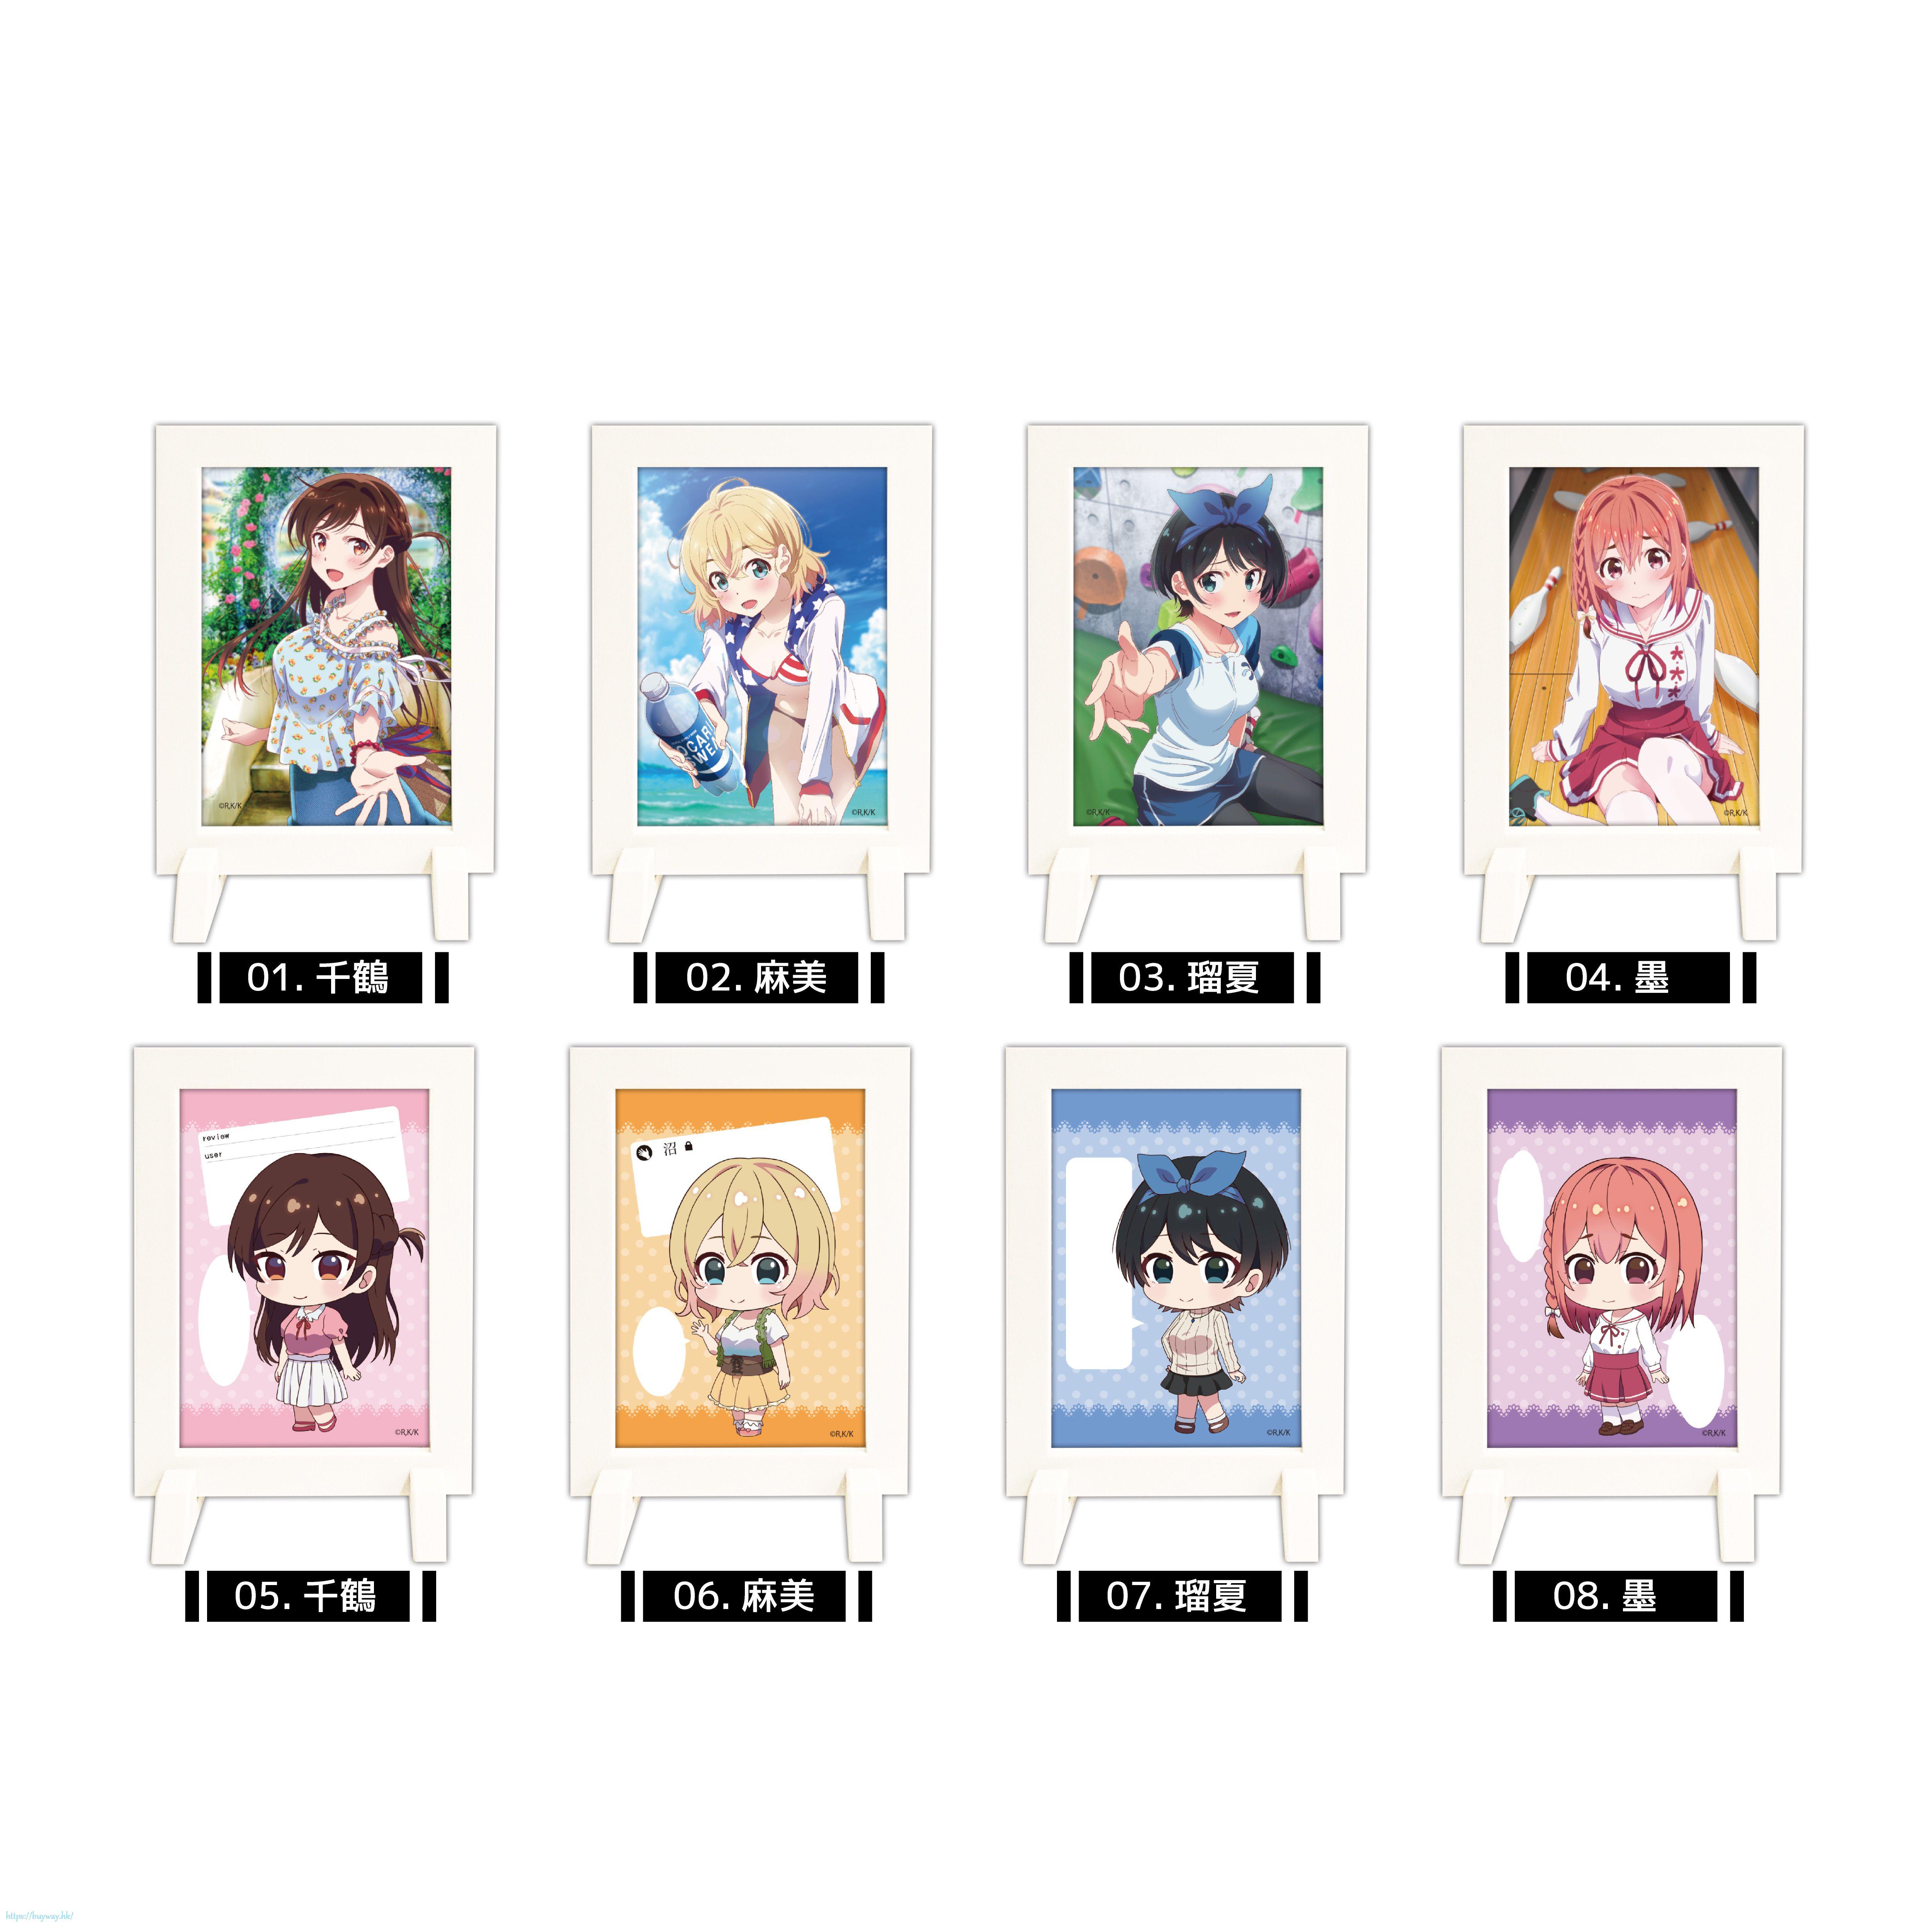 出租女友 相片 + 支架 Vol.1 (8 個入) Kisekae Photo Stand 01 Vol. 1 (8 Pieces)【Rent-A-Girlfriend】